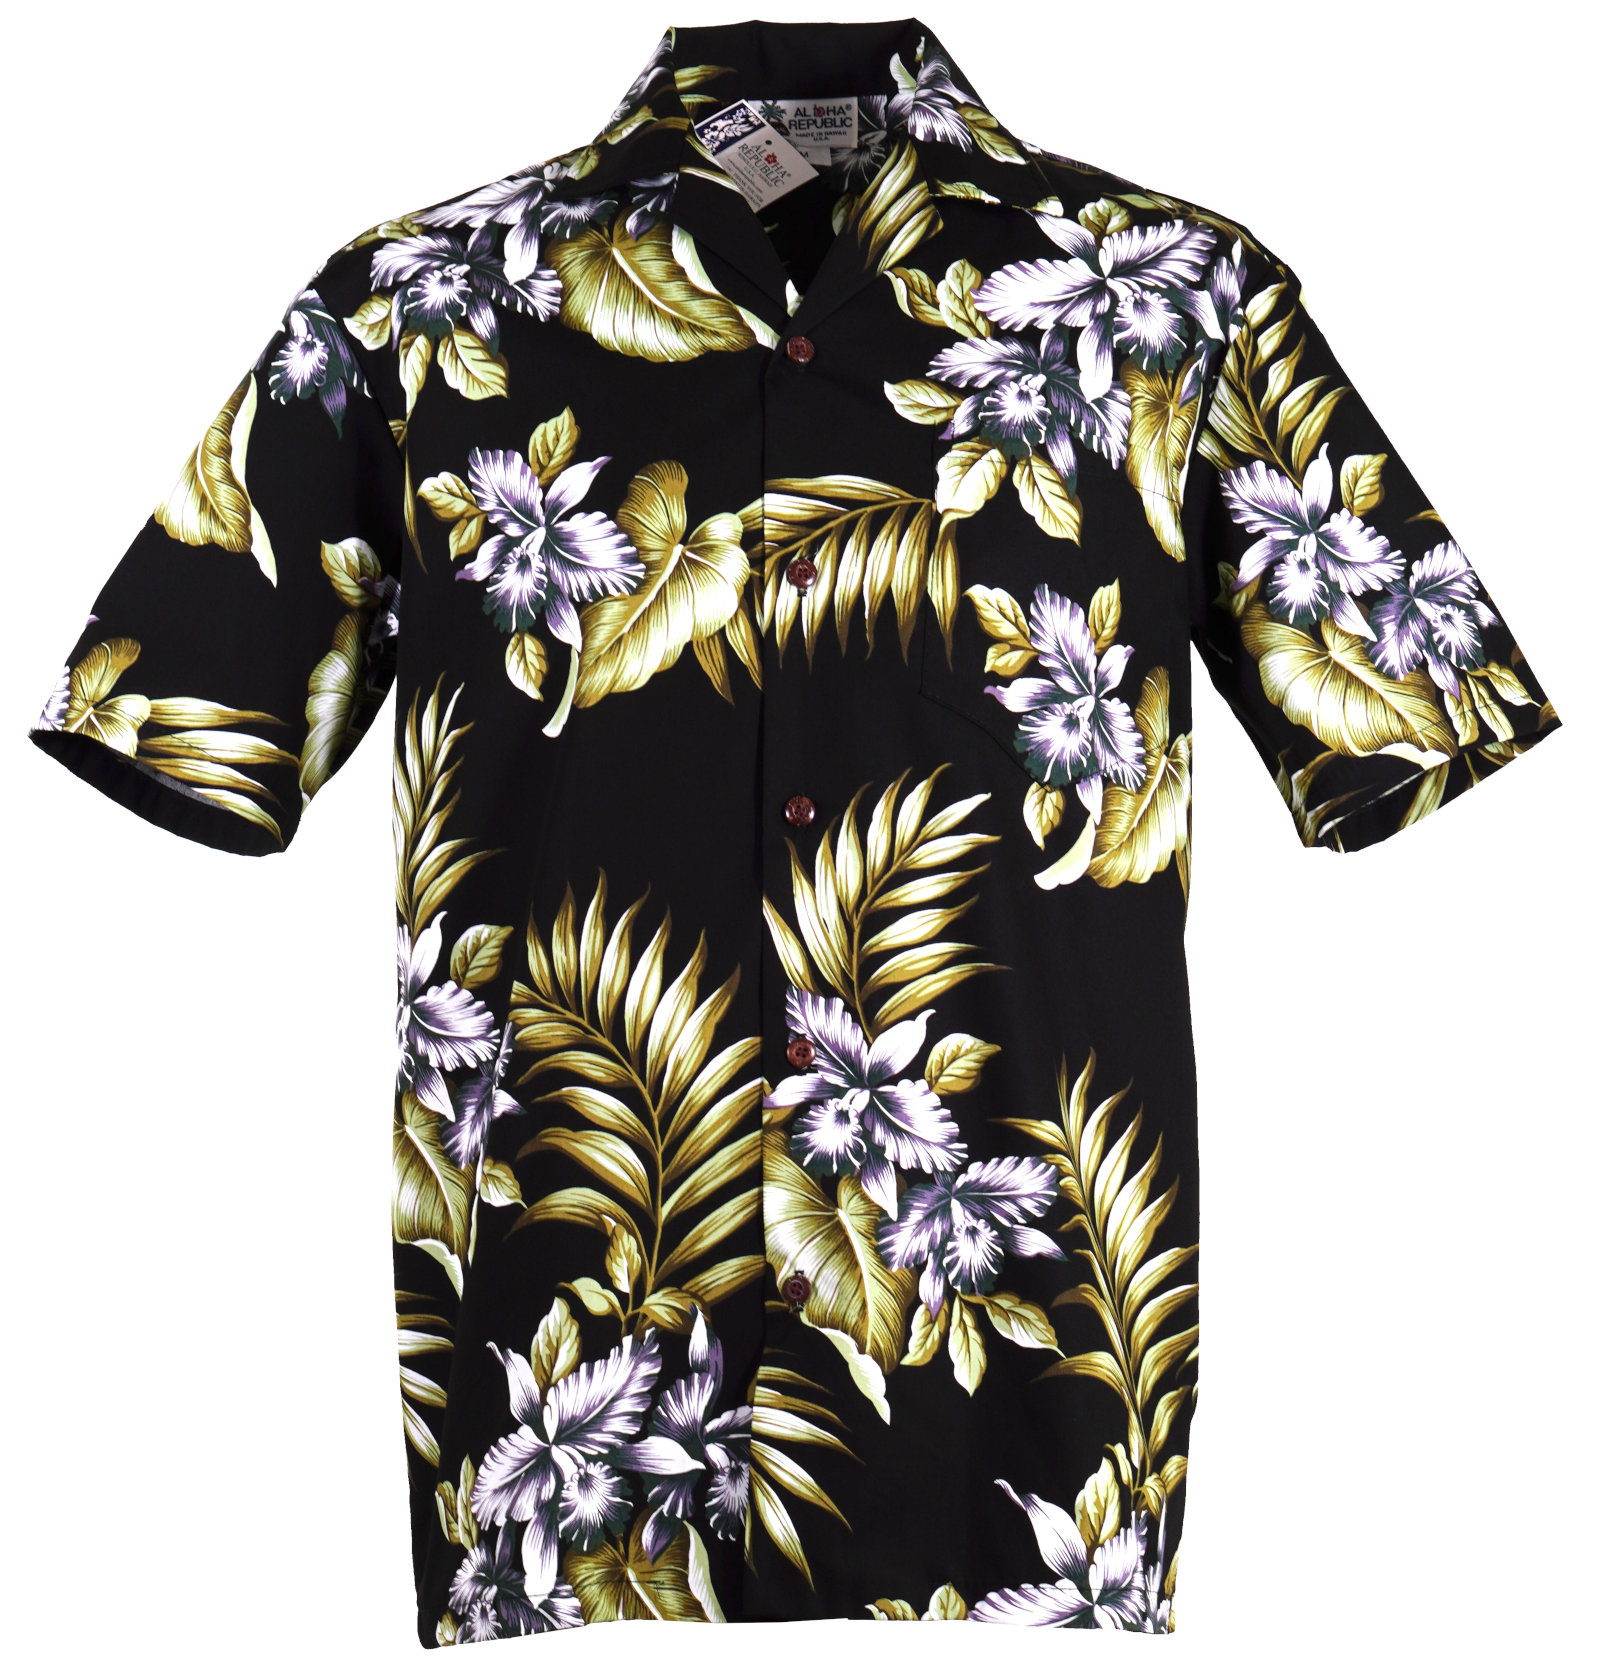 Original Hawaiihemd -TheHipster-